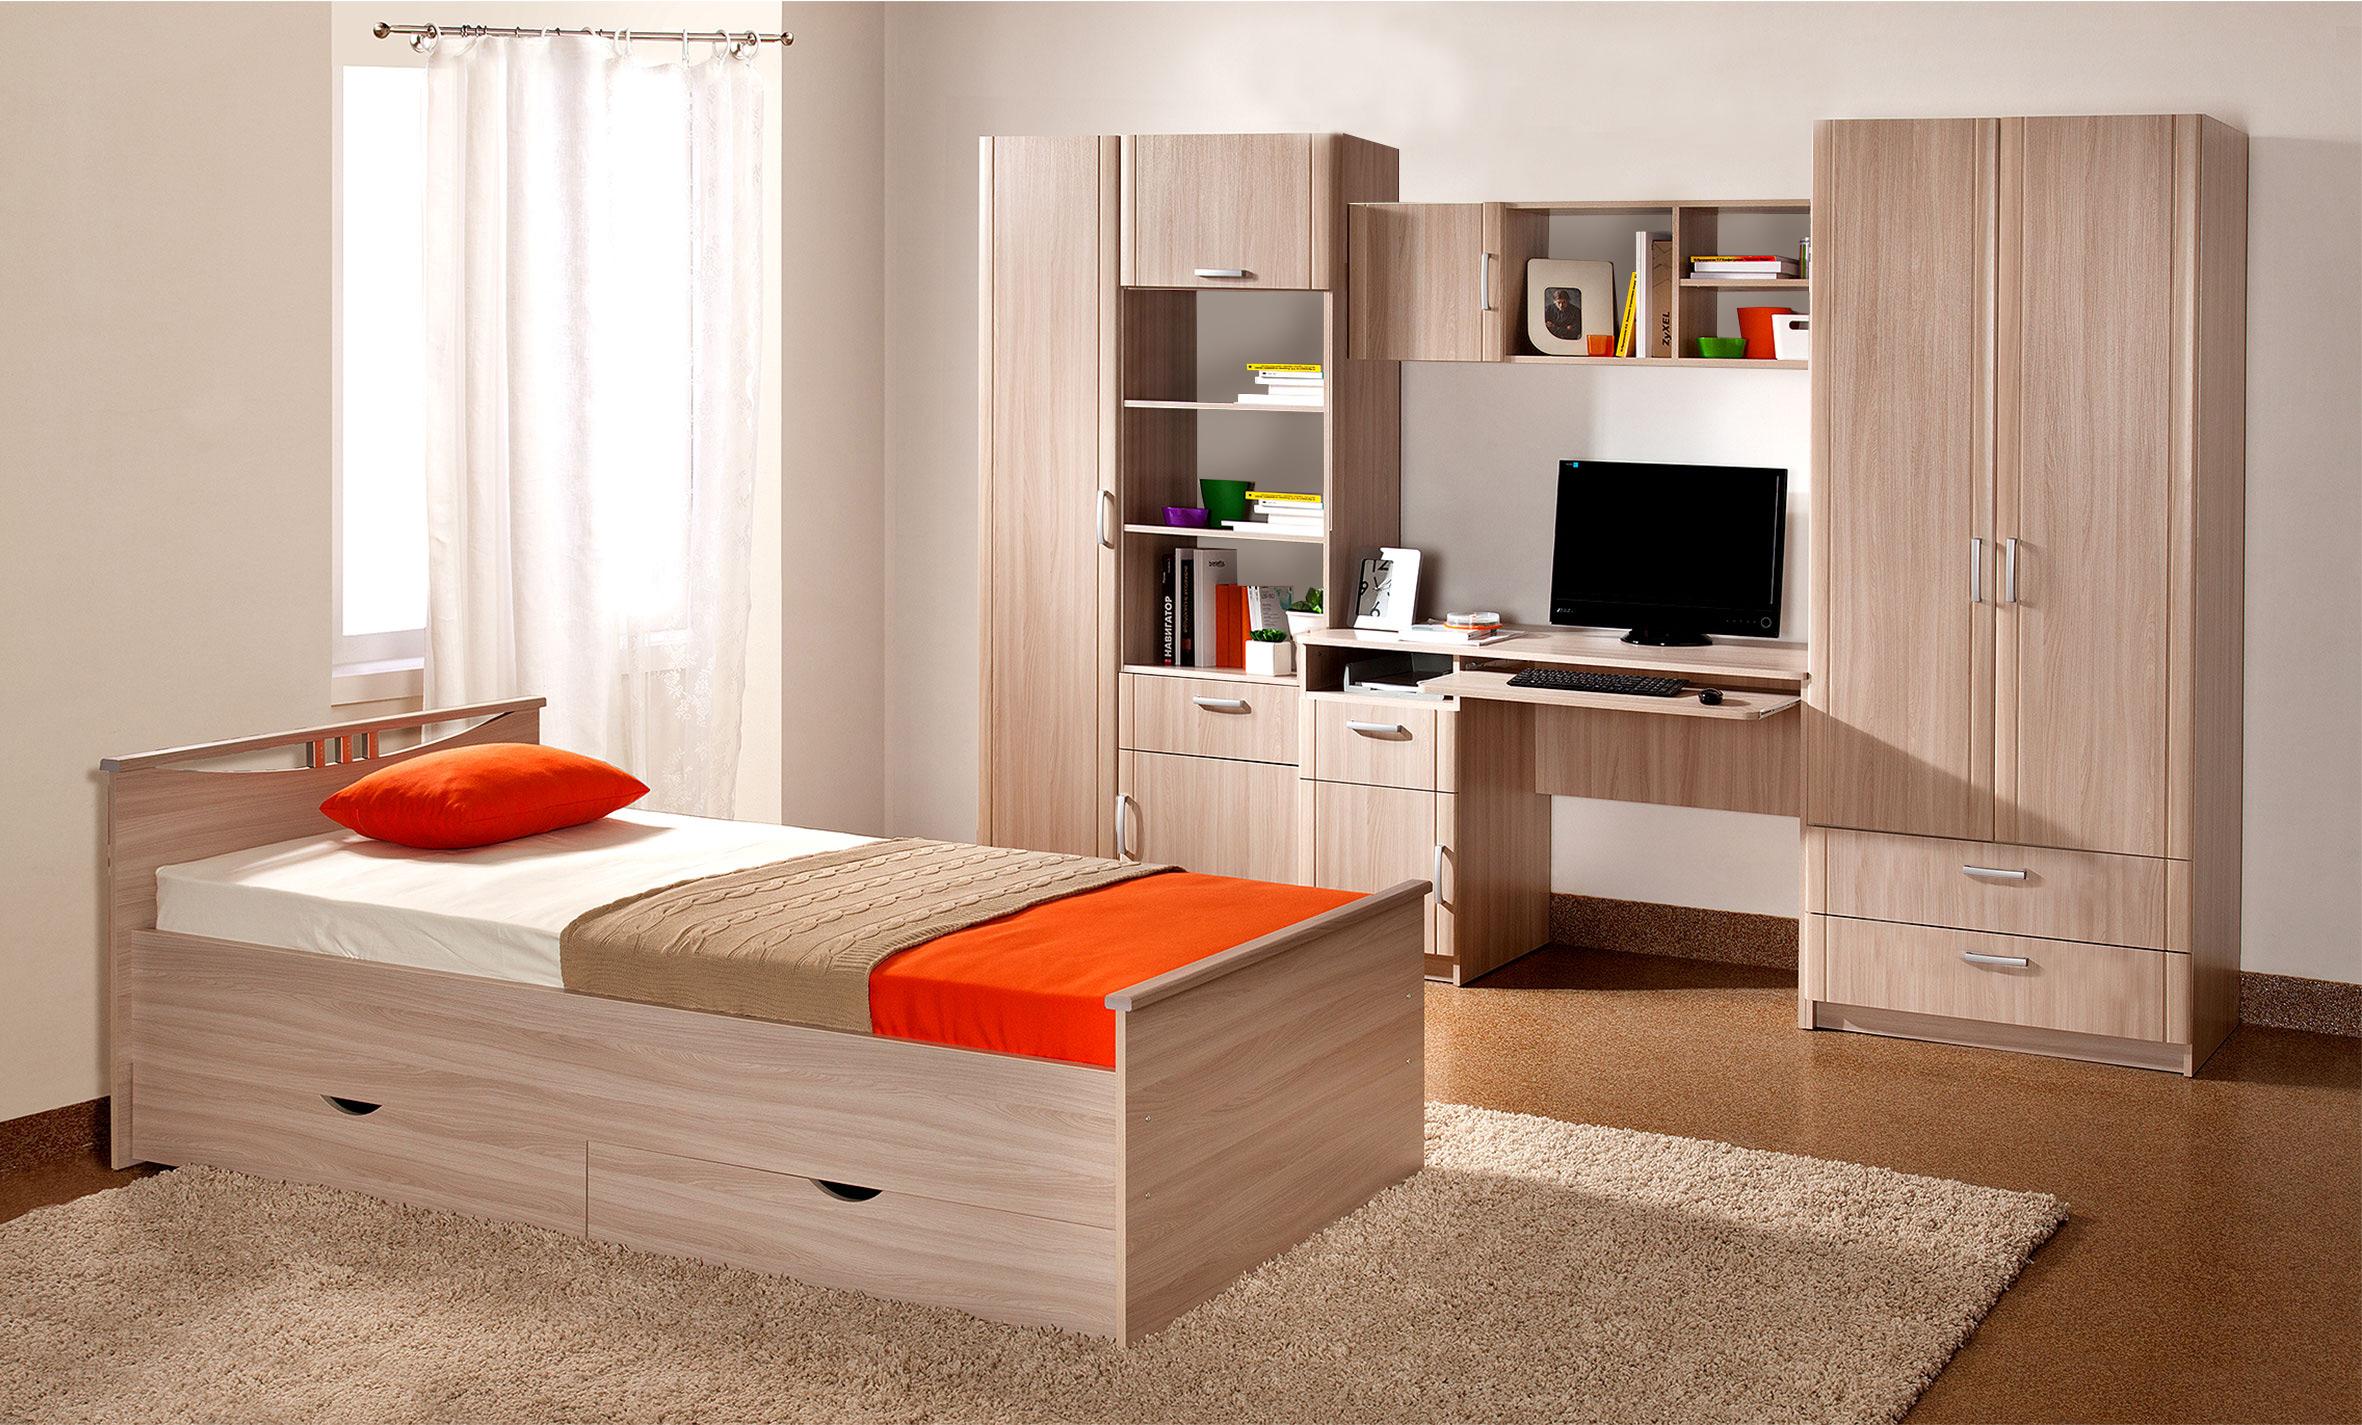 Детская комната Лотос-6 advesta детская комната advesta princess 6 предметов